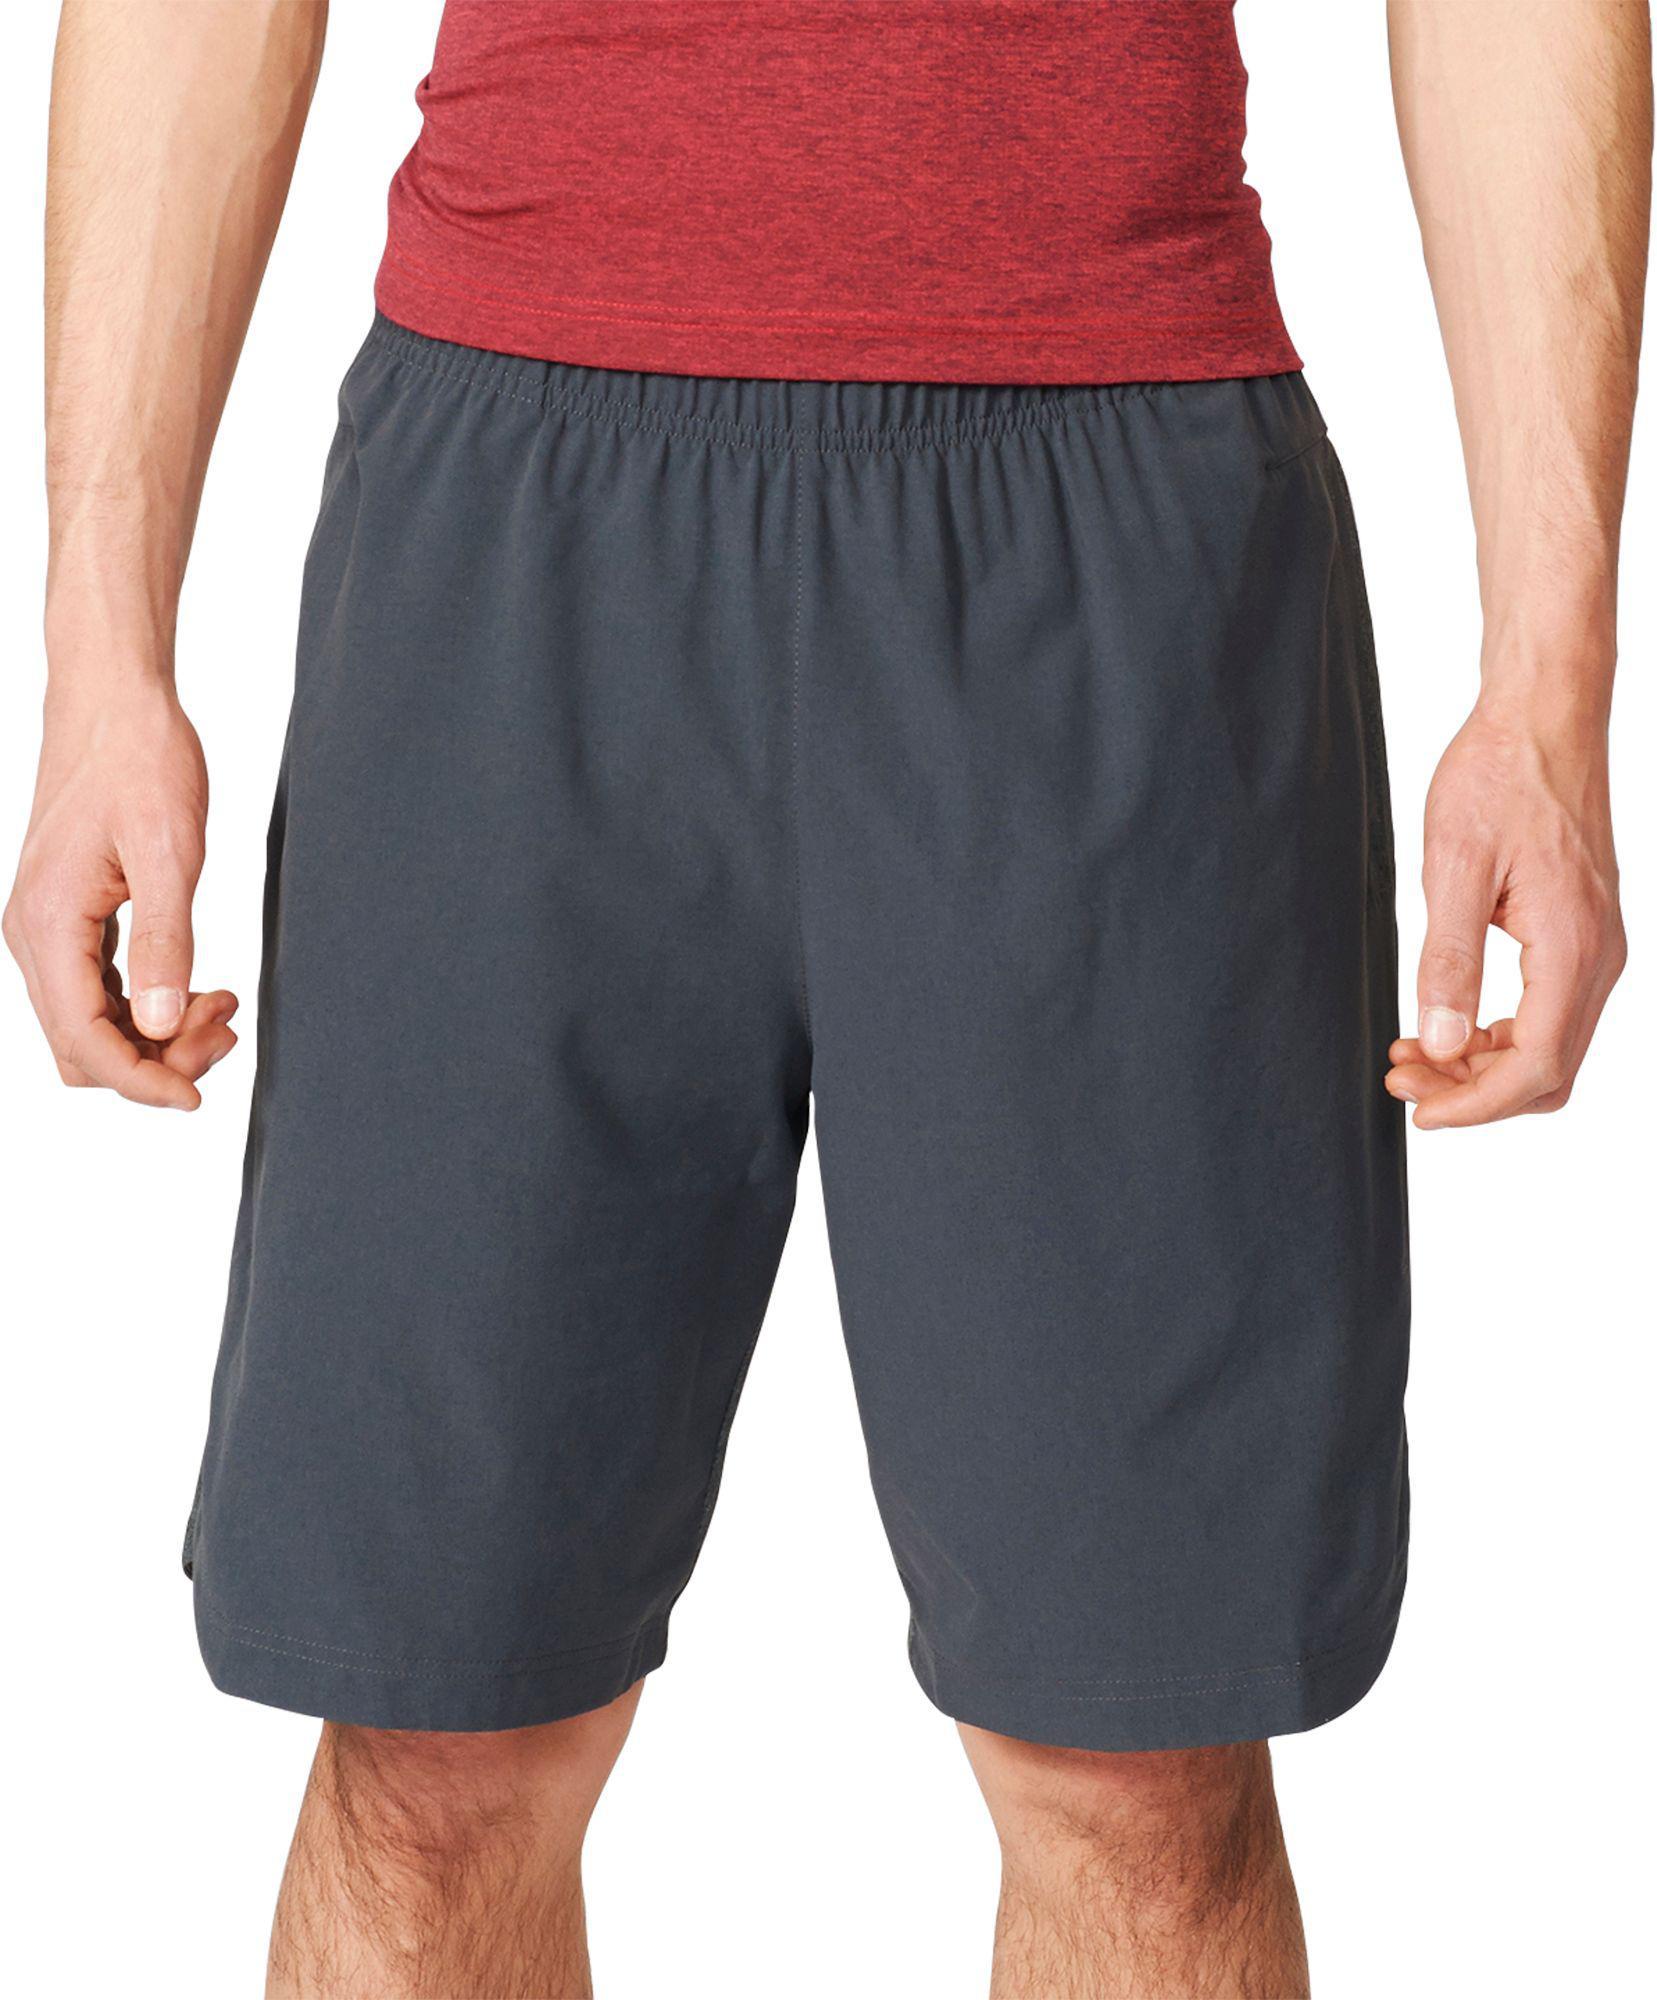 lyst adidas atleta id pantaloncini in nero per gli uomini.